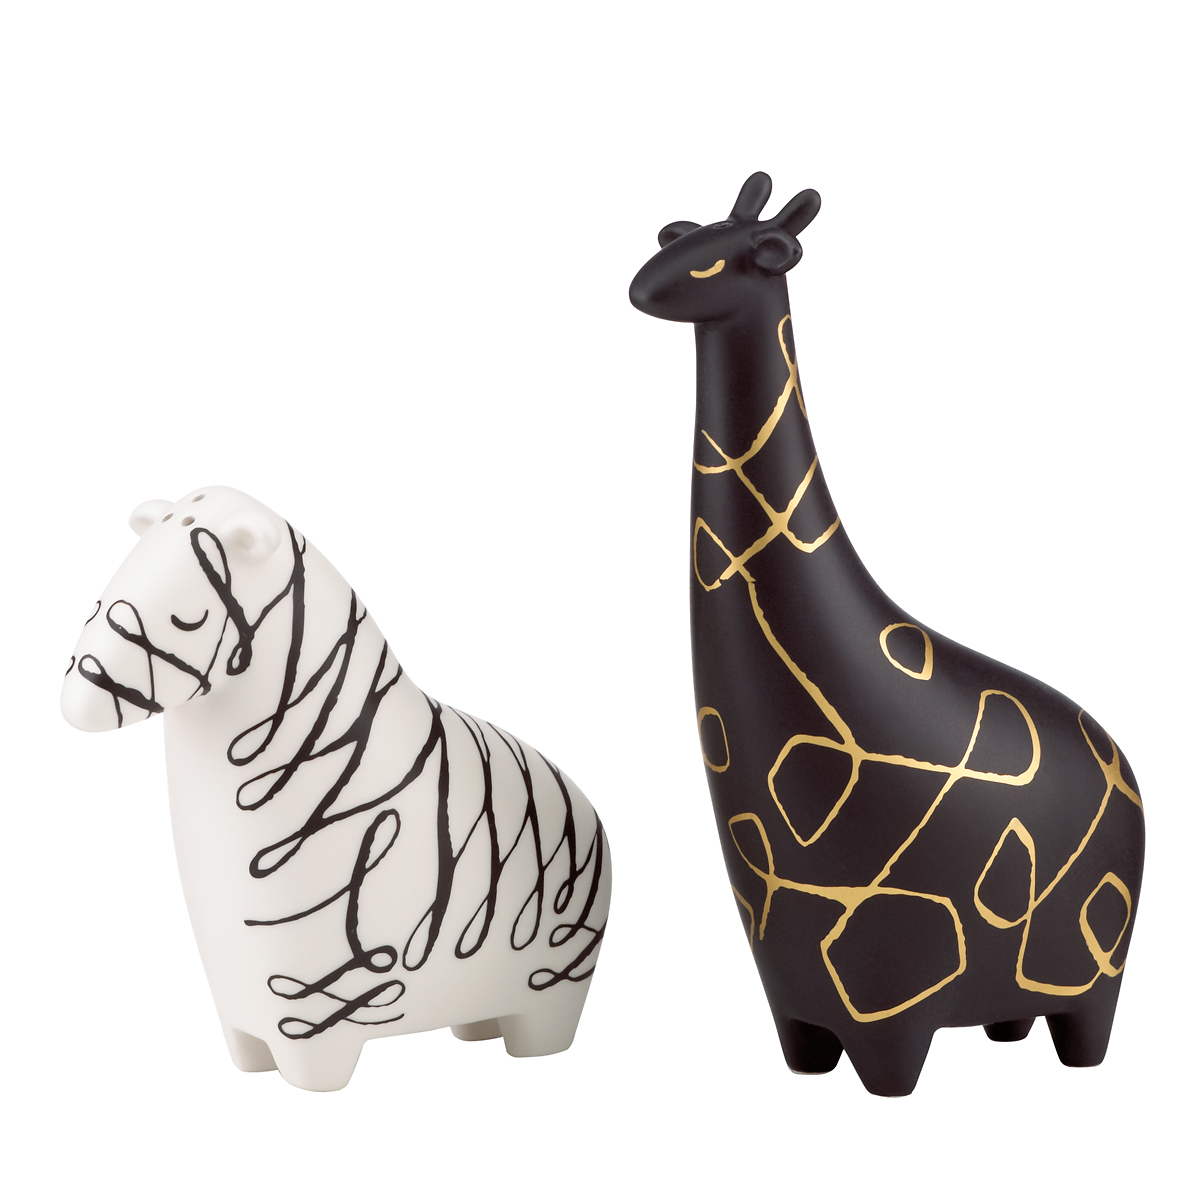 Kate Spade China by Lenox, Woodland Park Zebra And Giraffe Salt And Pepper